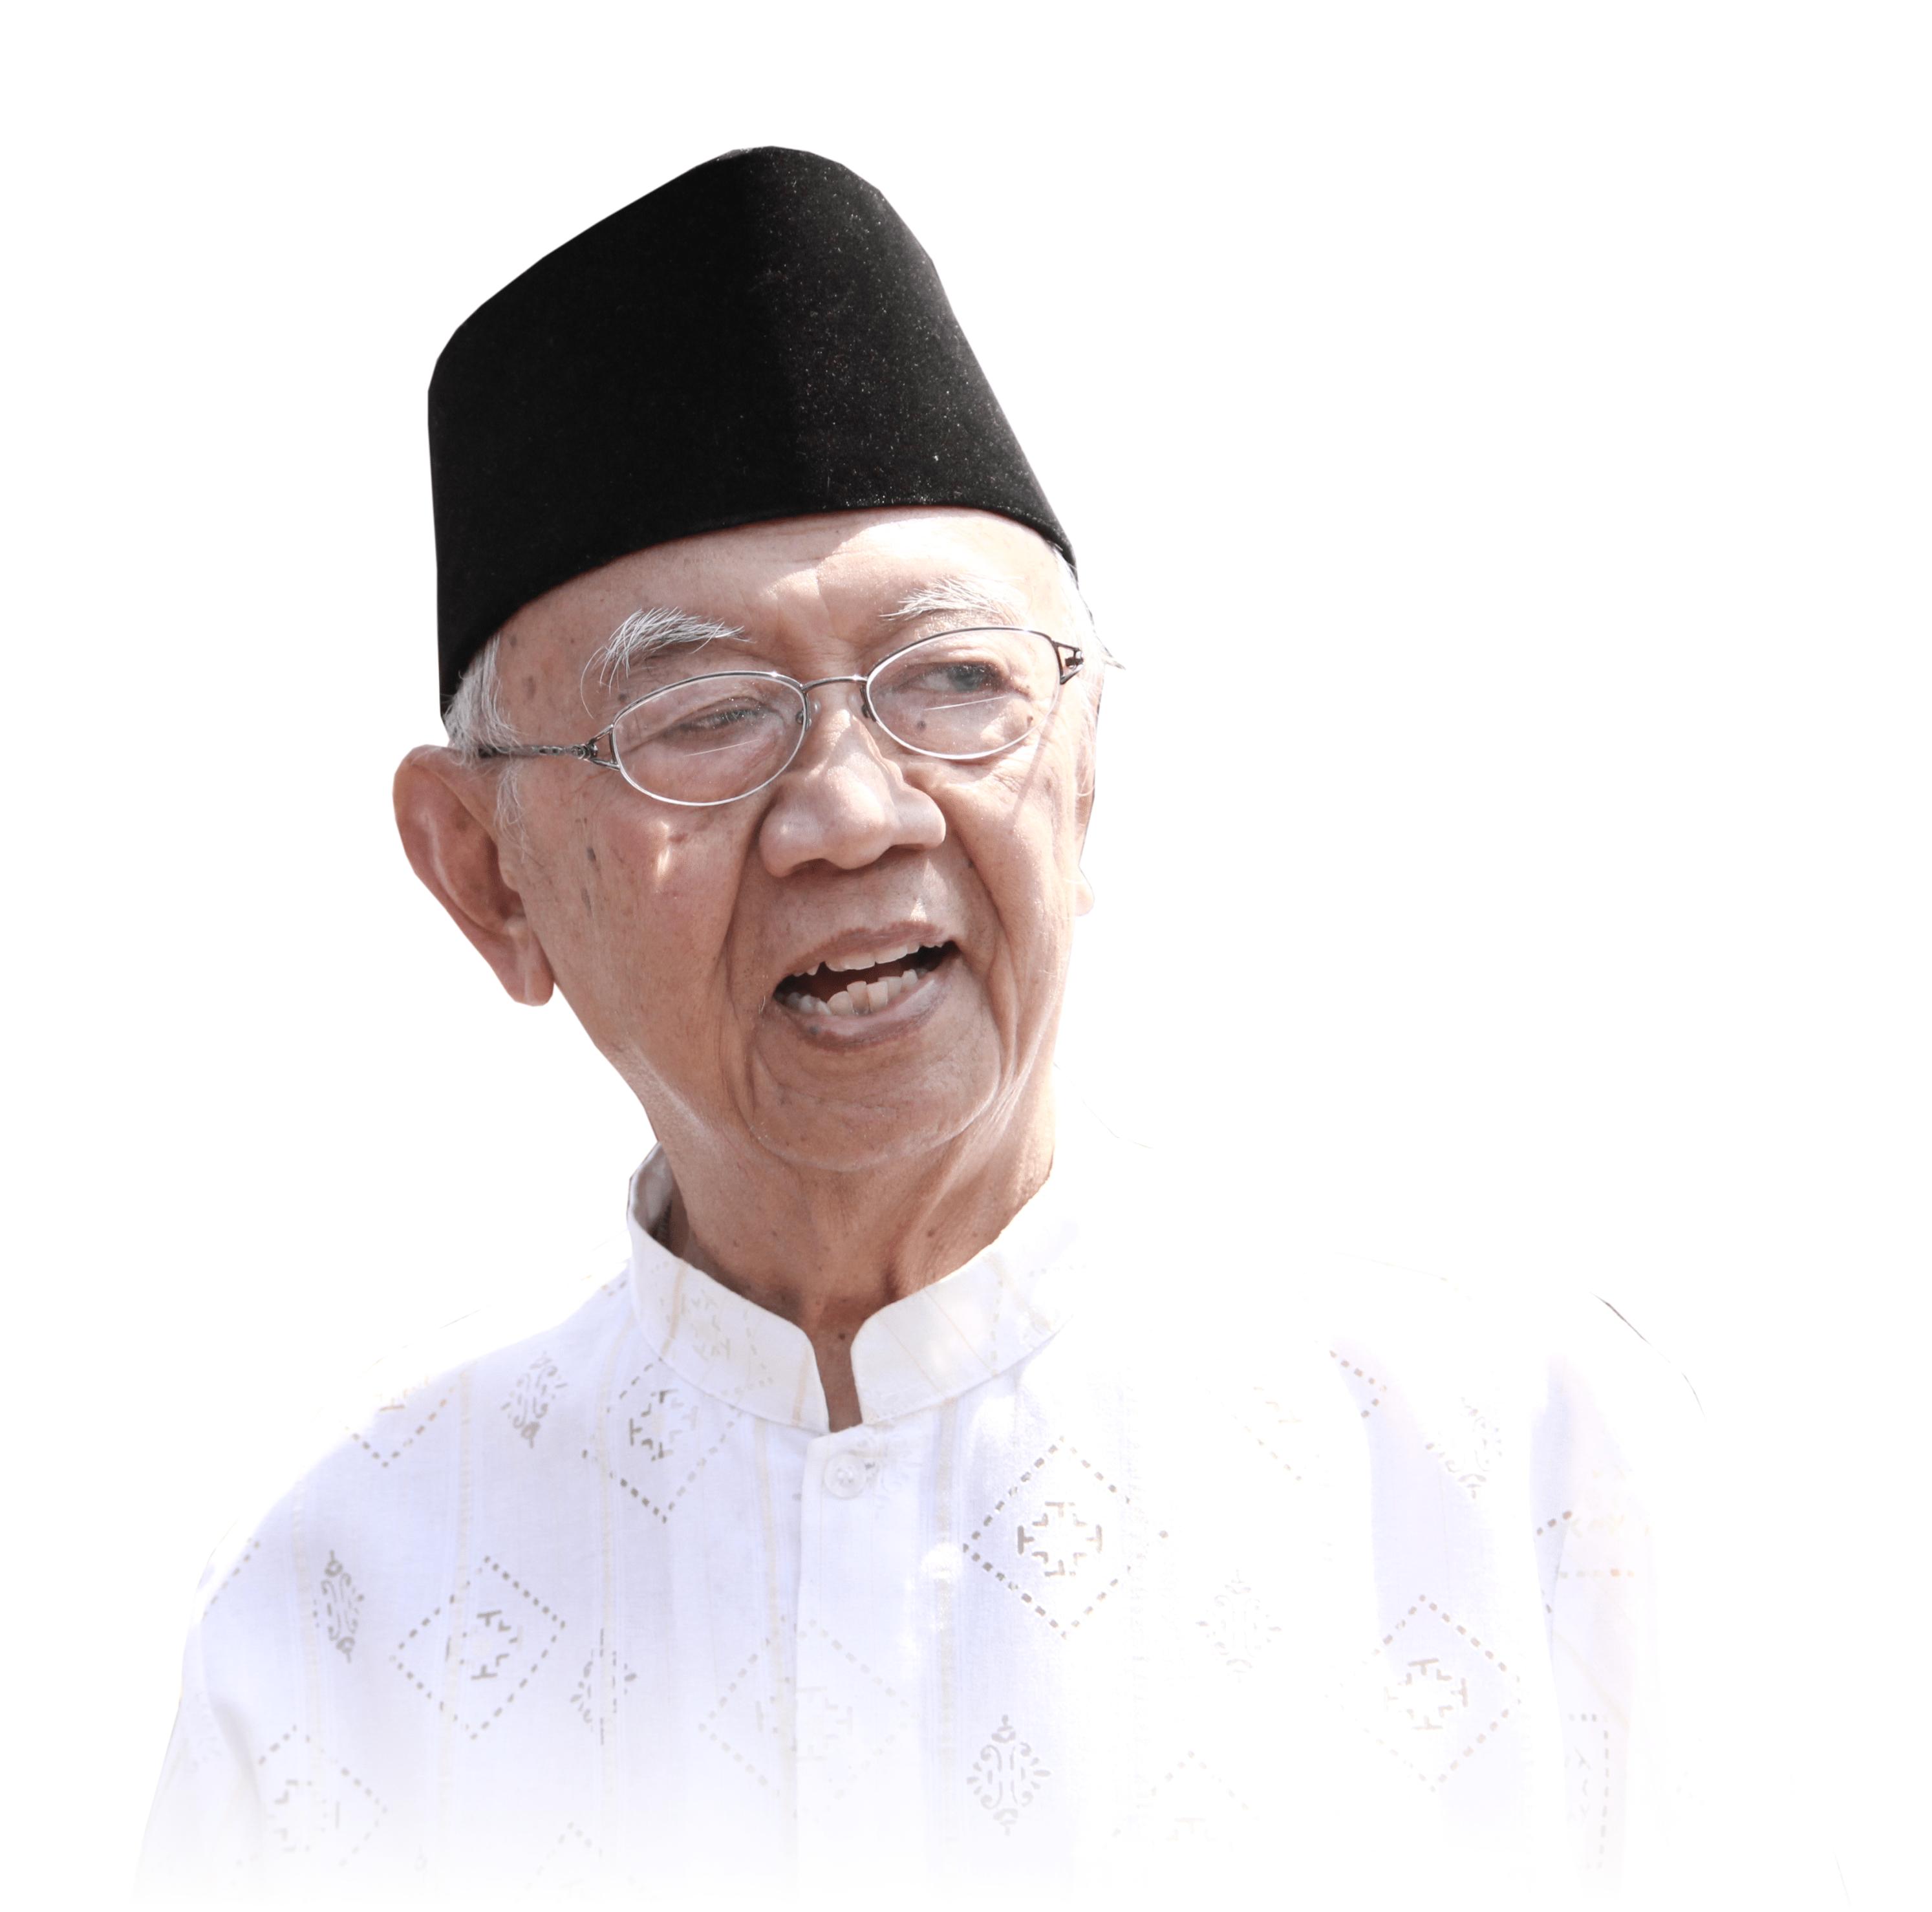 Gus Sholah-Toleransi Memperkuat Persatuan Indonesia-IslamRamah.co